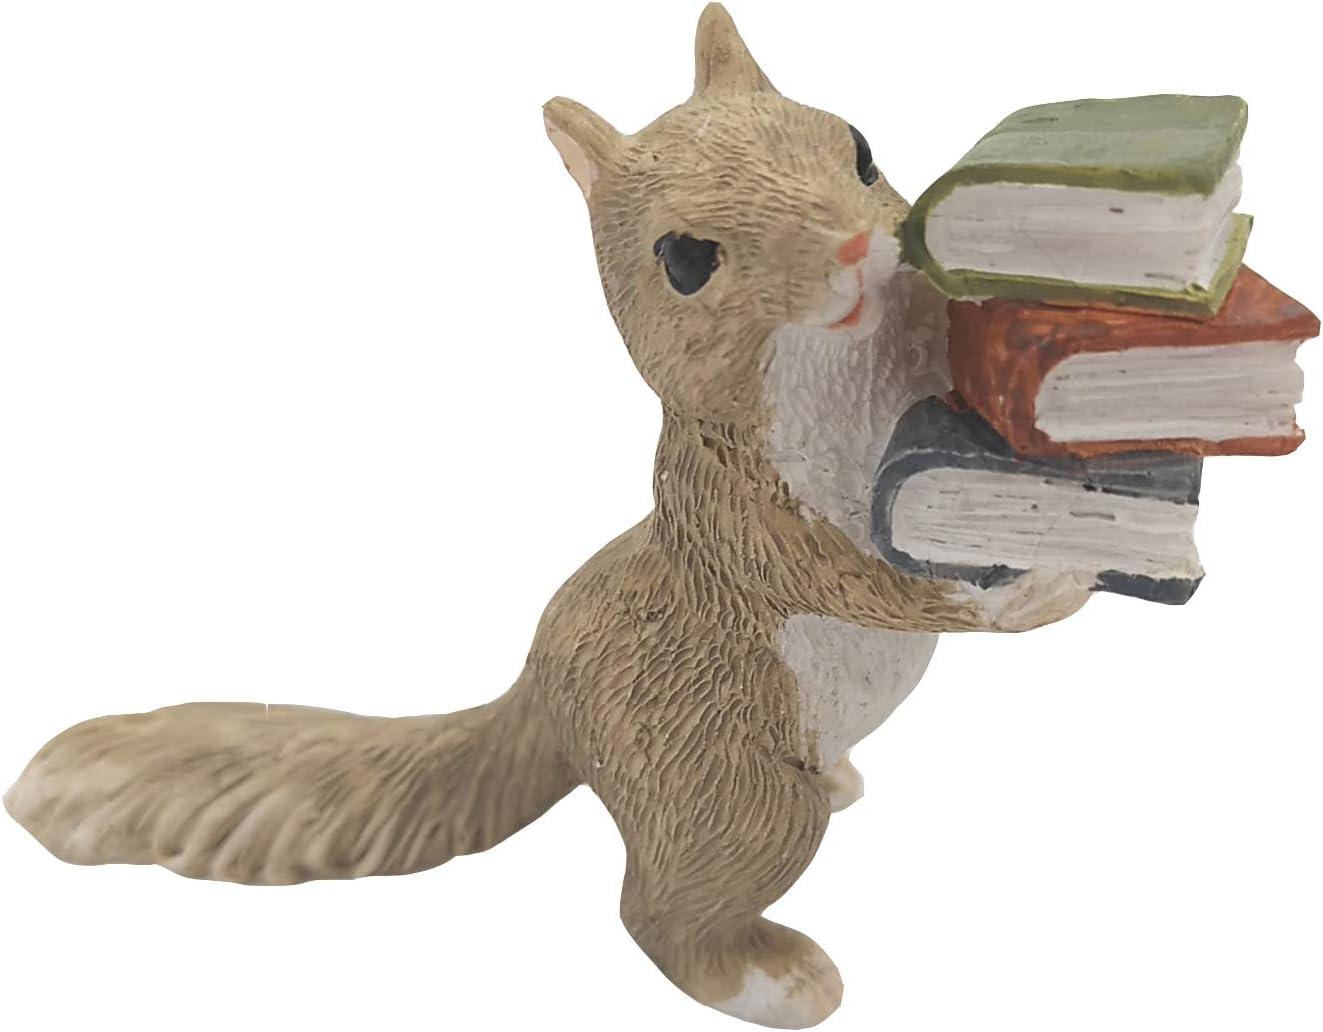 Gemmia Miniature Fairy Garden Squirrel Figurine-Raise Books Squirrel